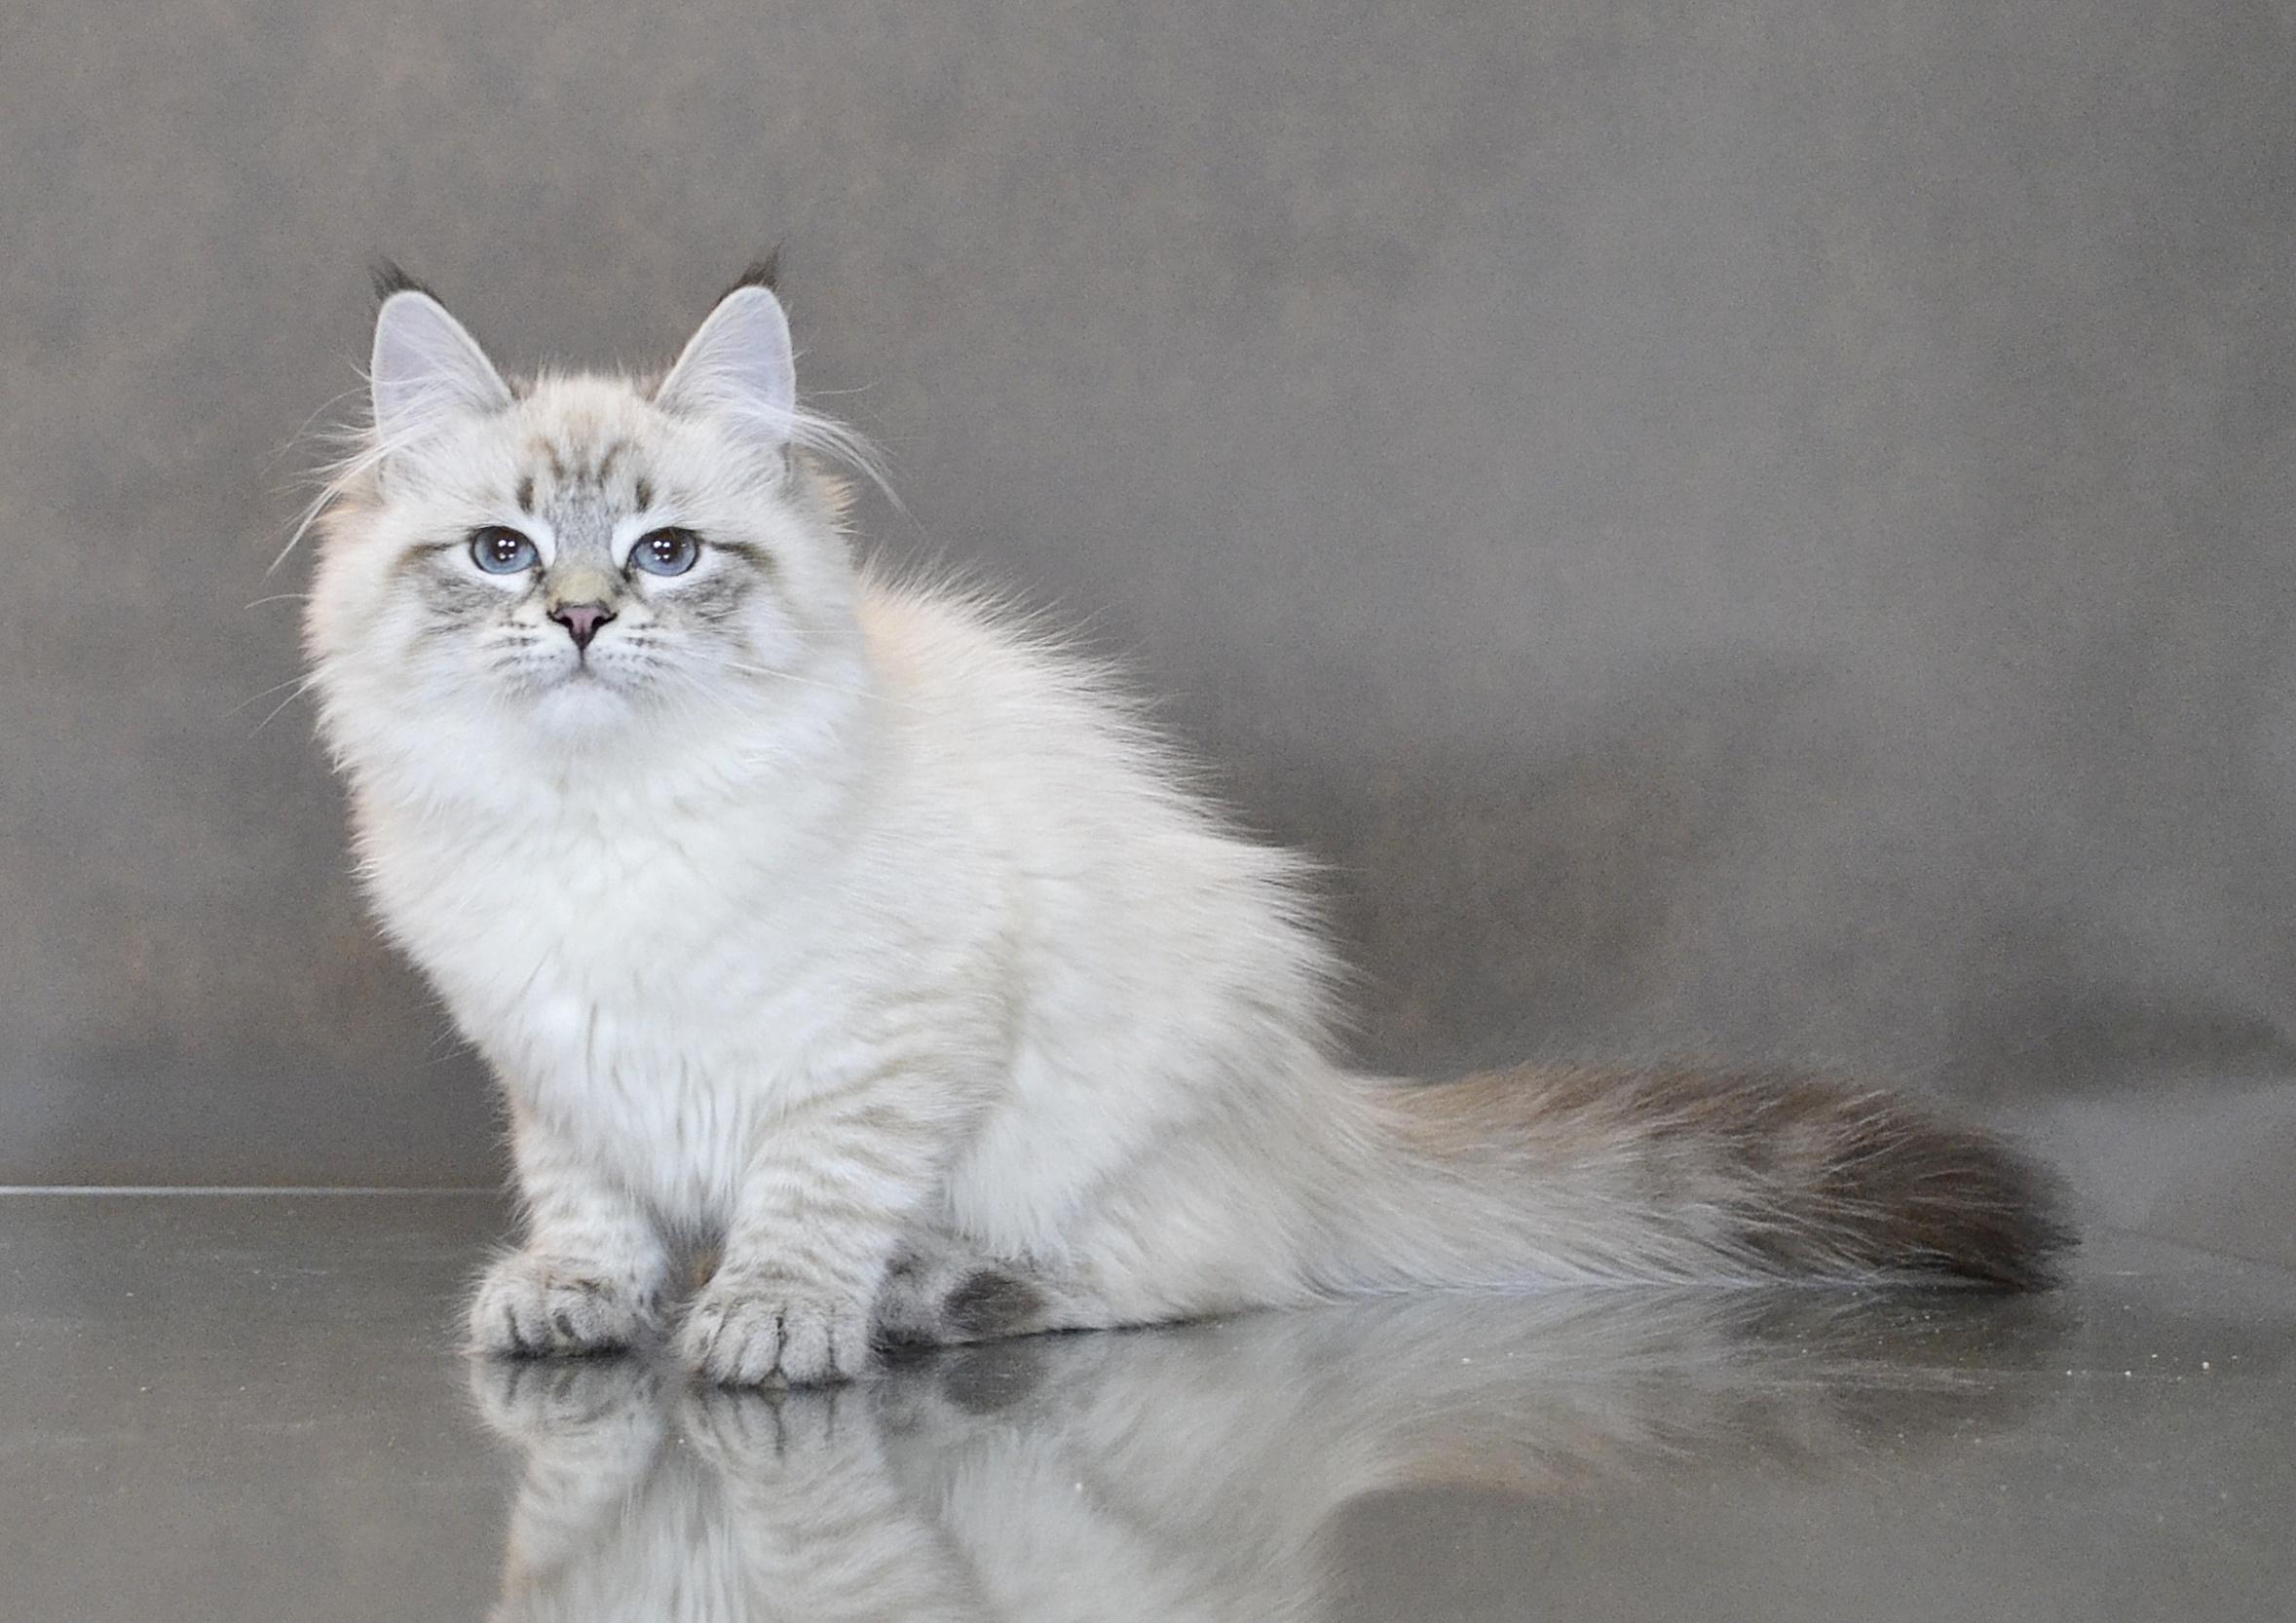 koty-syberyjskie-neva-masquerade-warszawa